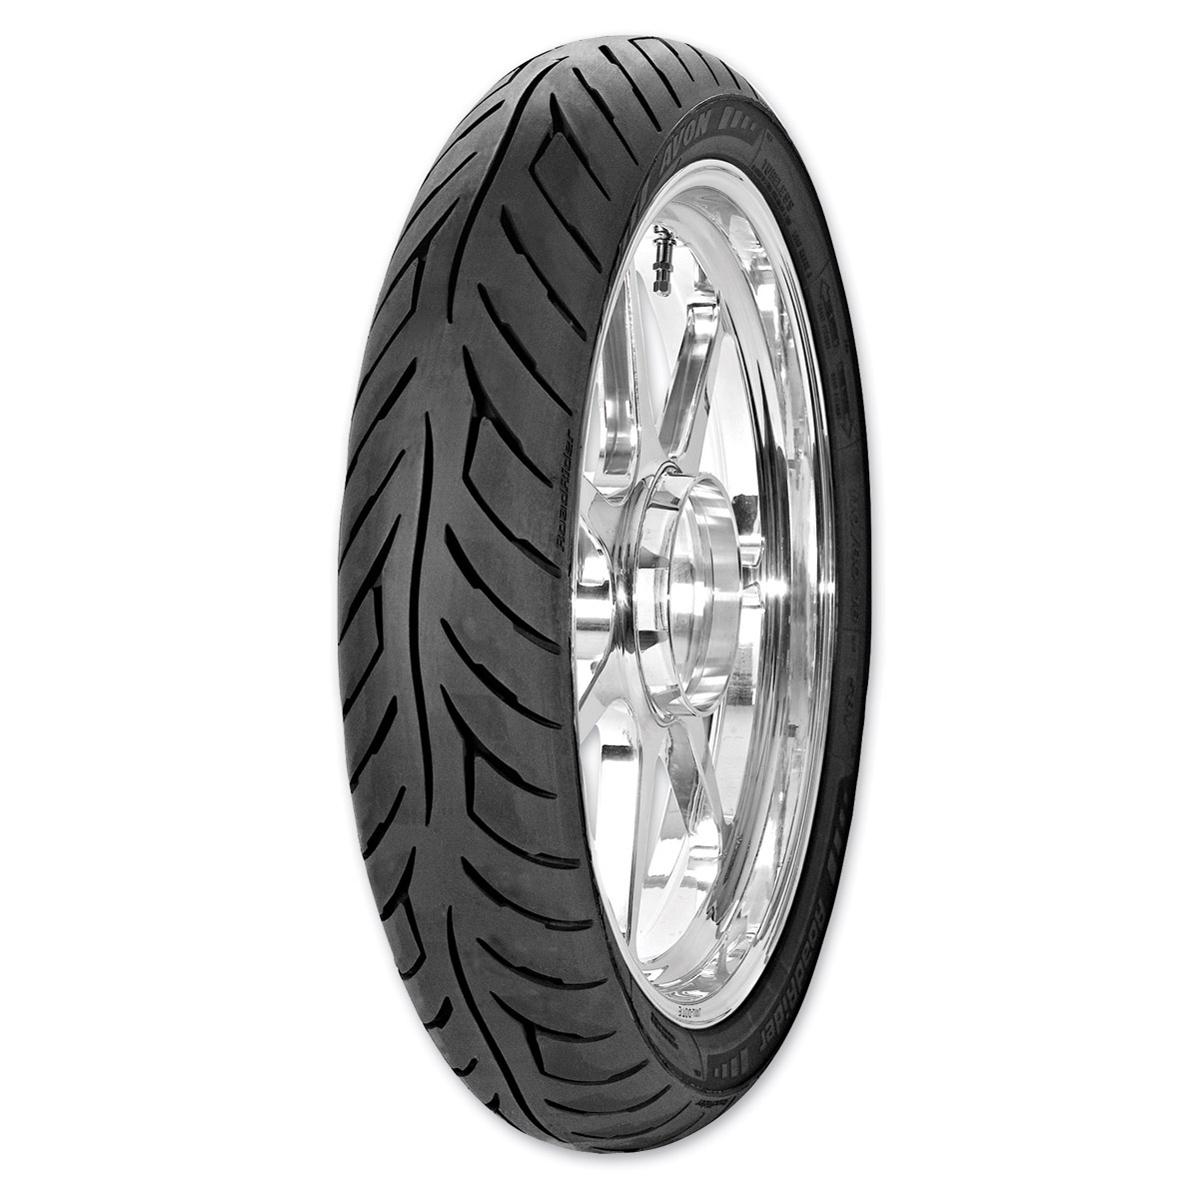 Avon AM26 Roadrider 90/90-18 Rear Tire